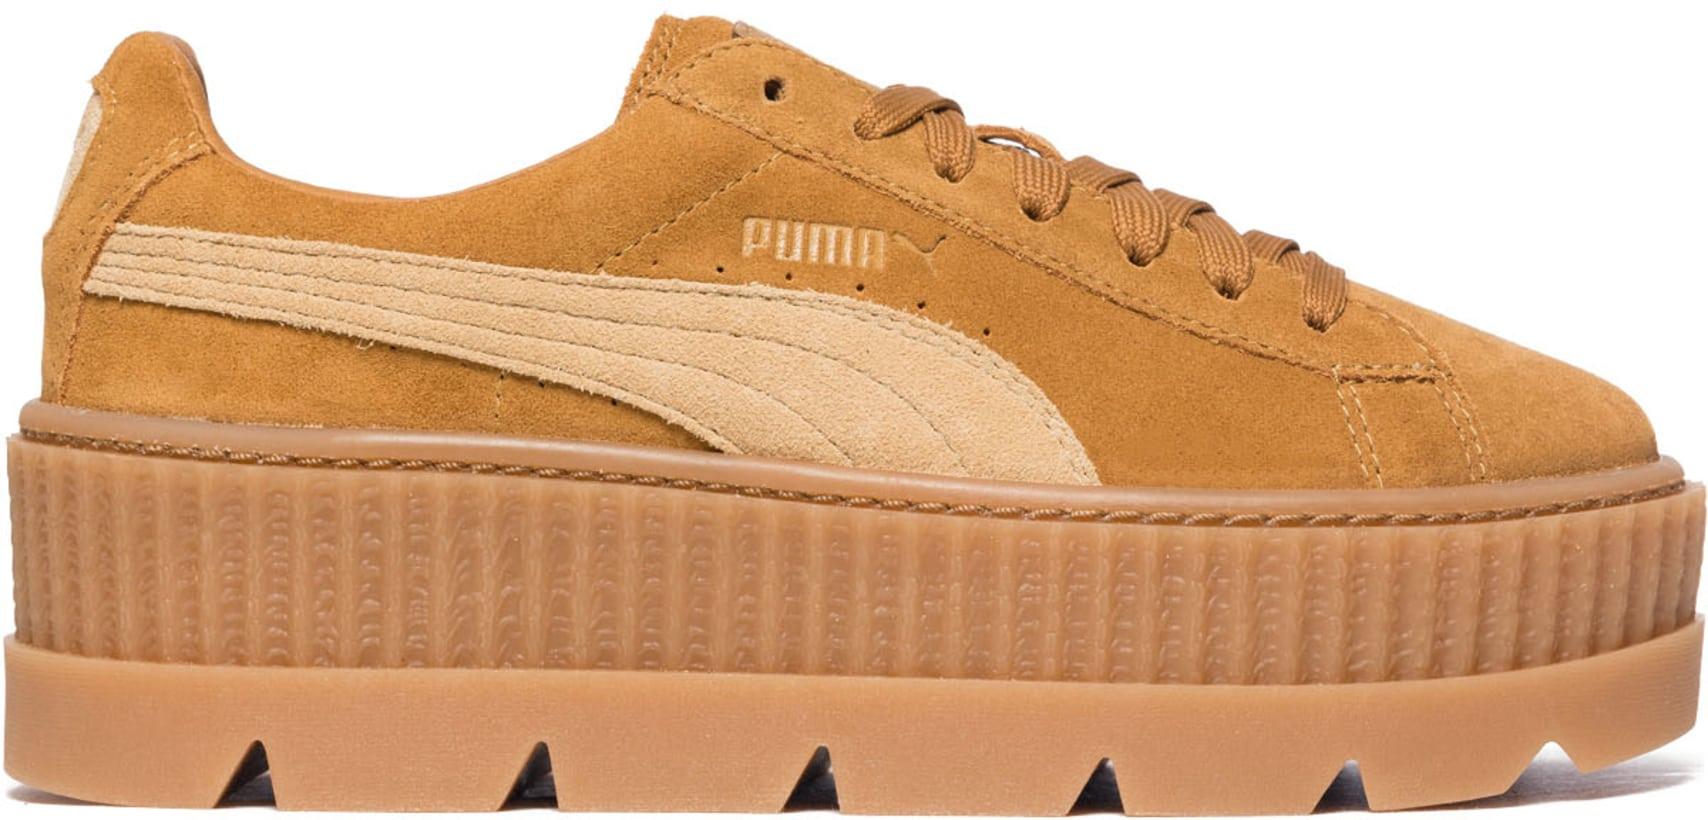 release date: 76f45 09bdd Puma - Fenty Cleated Creeper - Brown Lark